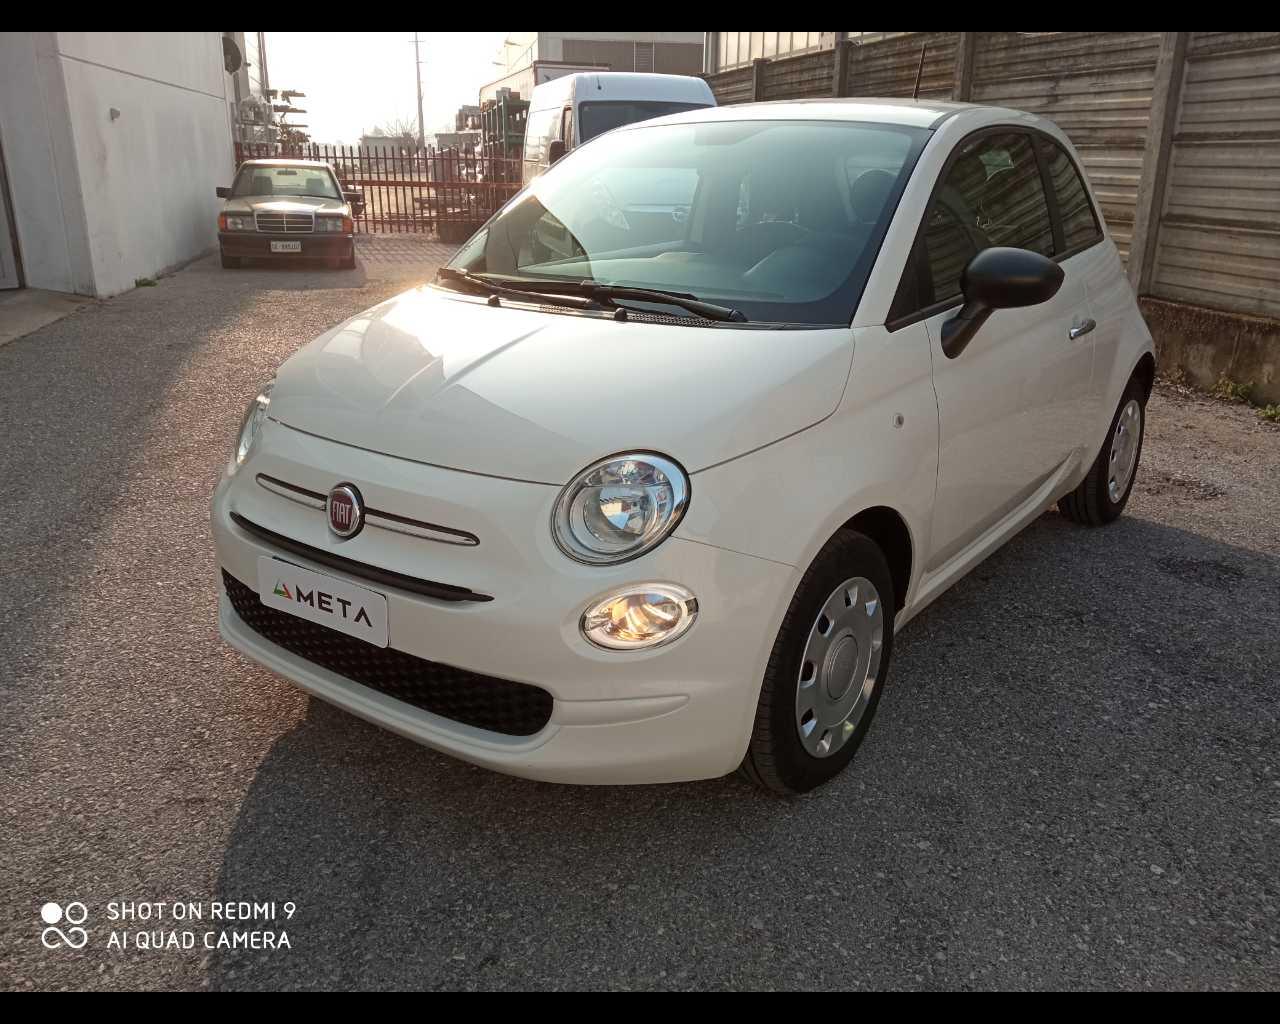 FIAT  500 1.2 Pop 69cv my20, Benzina Verde, €10.700 - 500 2015 Benzina - 500 1.2 Pop 69cv My20